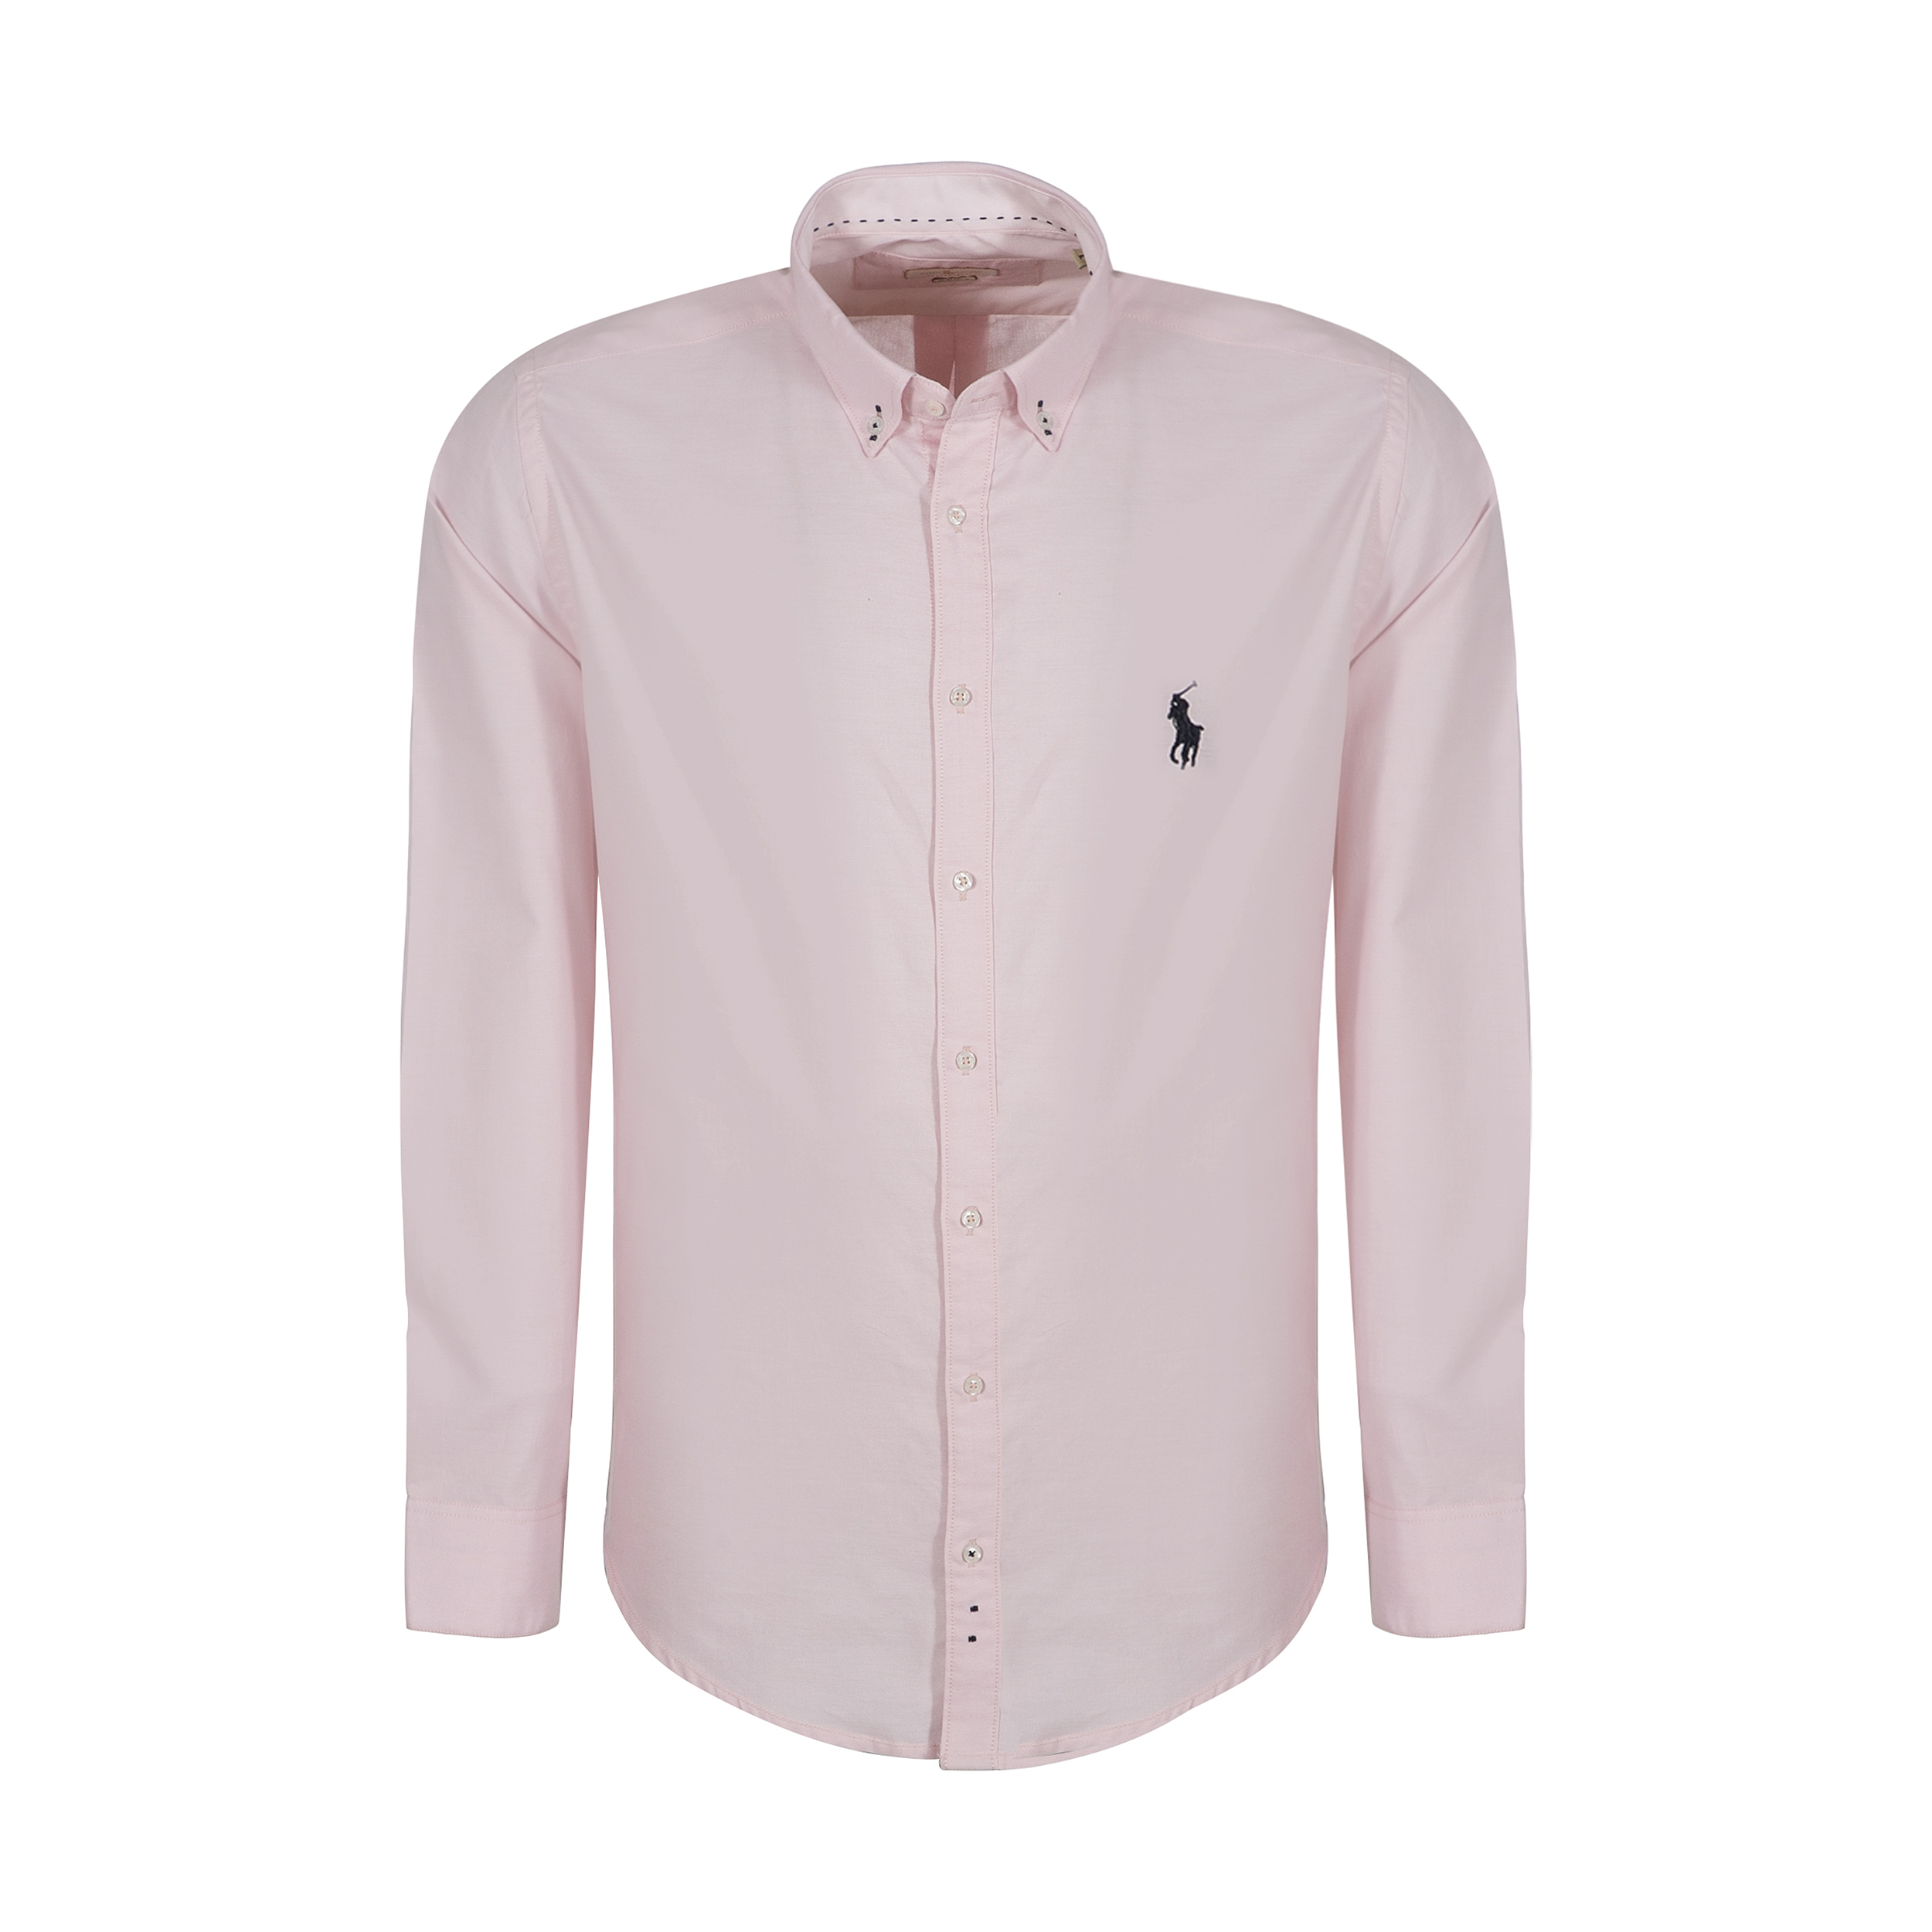 پیراهن مردانه پولو مدل LS01 رنگ صورتی